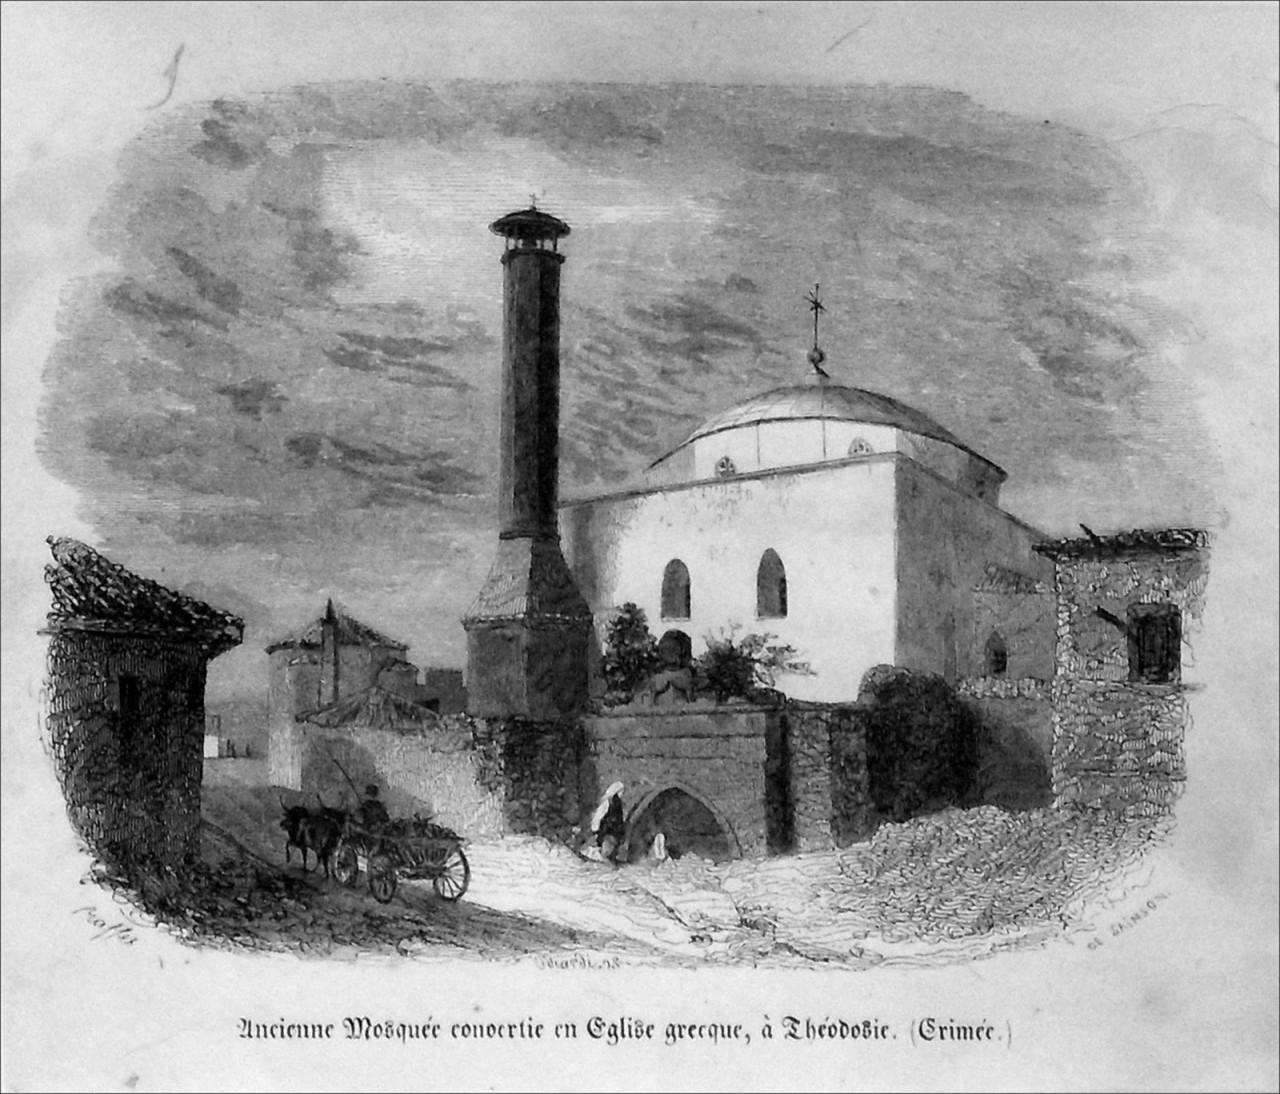 ancienne-mosquee-convertie-en-eglise-grecque-a-theodosie-gravu